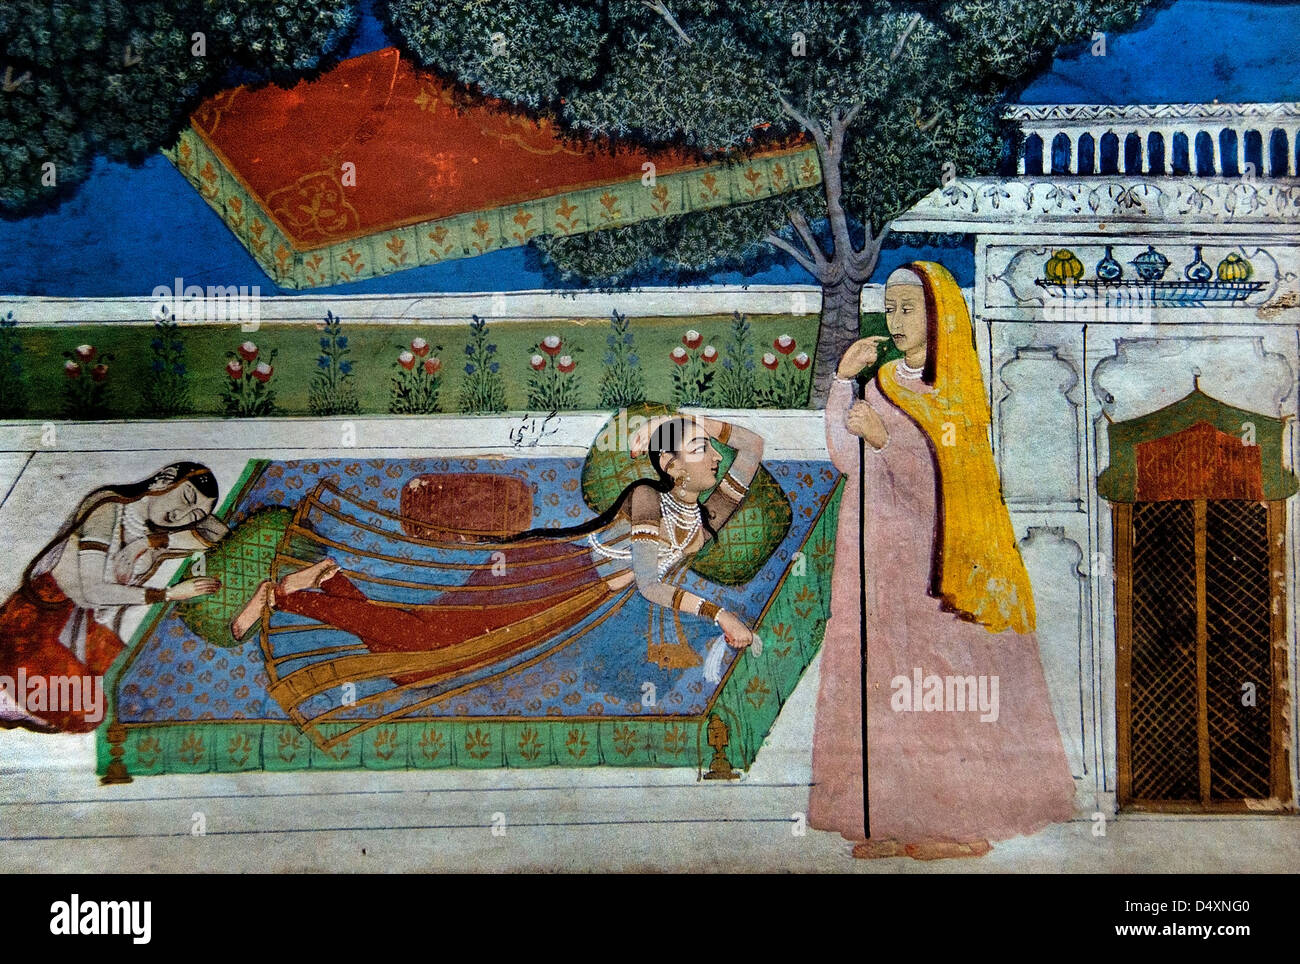 Indien datant Messenger